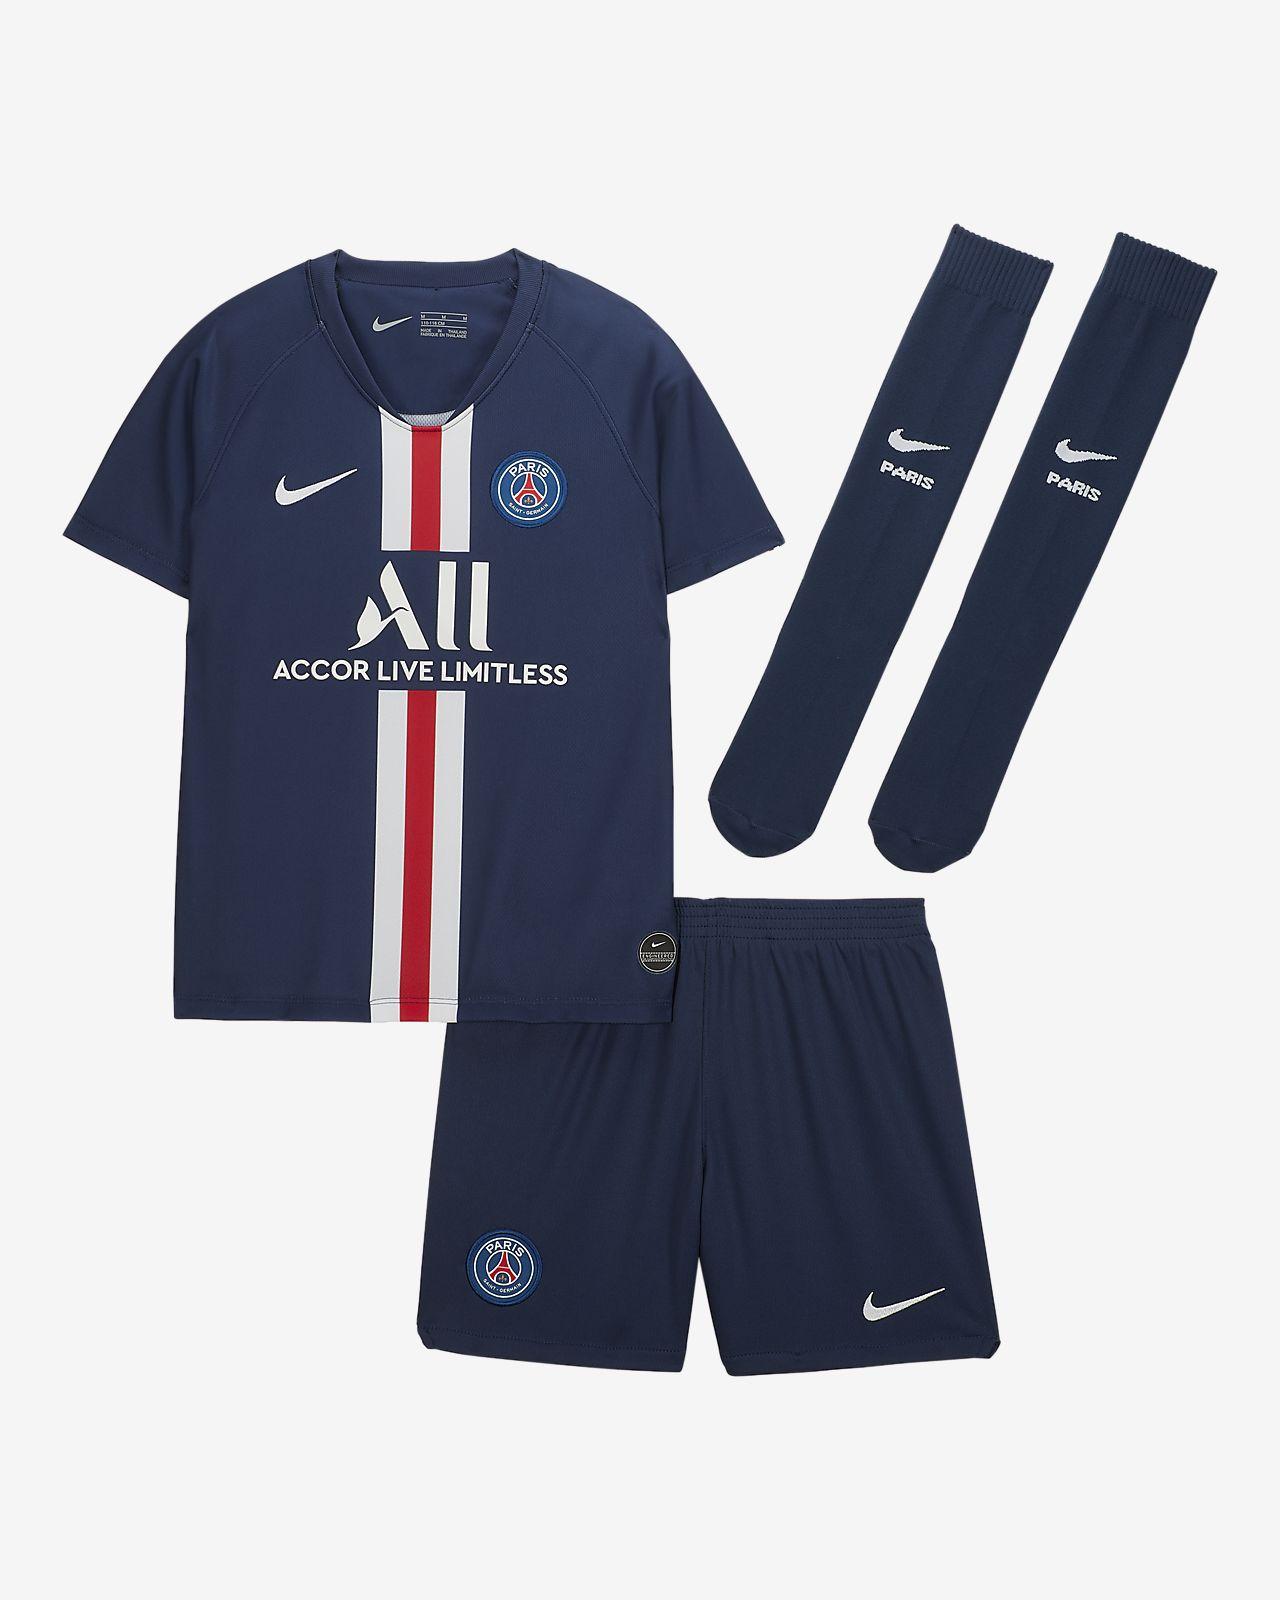 Paris Saint-Germain 2019/20 Home Fußballtrikot-Set für jüngere Kinder